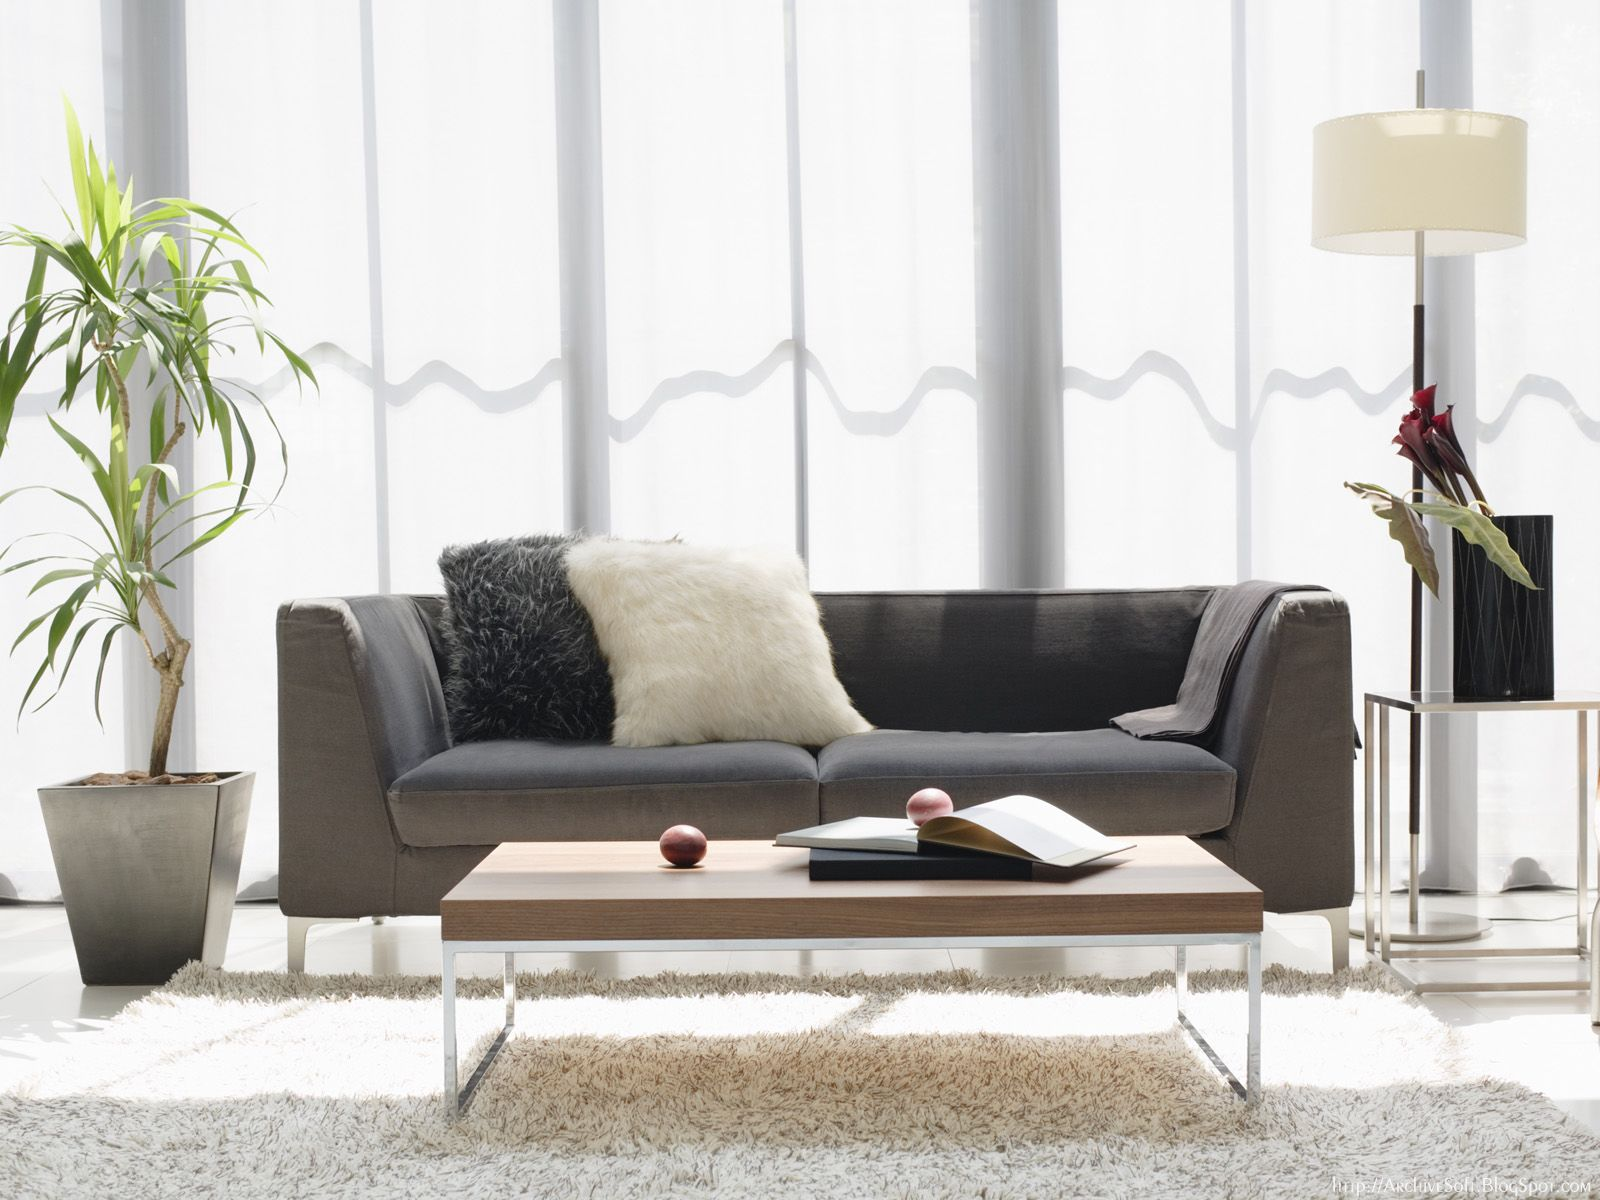 interior design desktop wallpaper interior design wallpaper mac 1600x1200